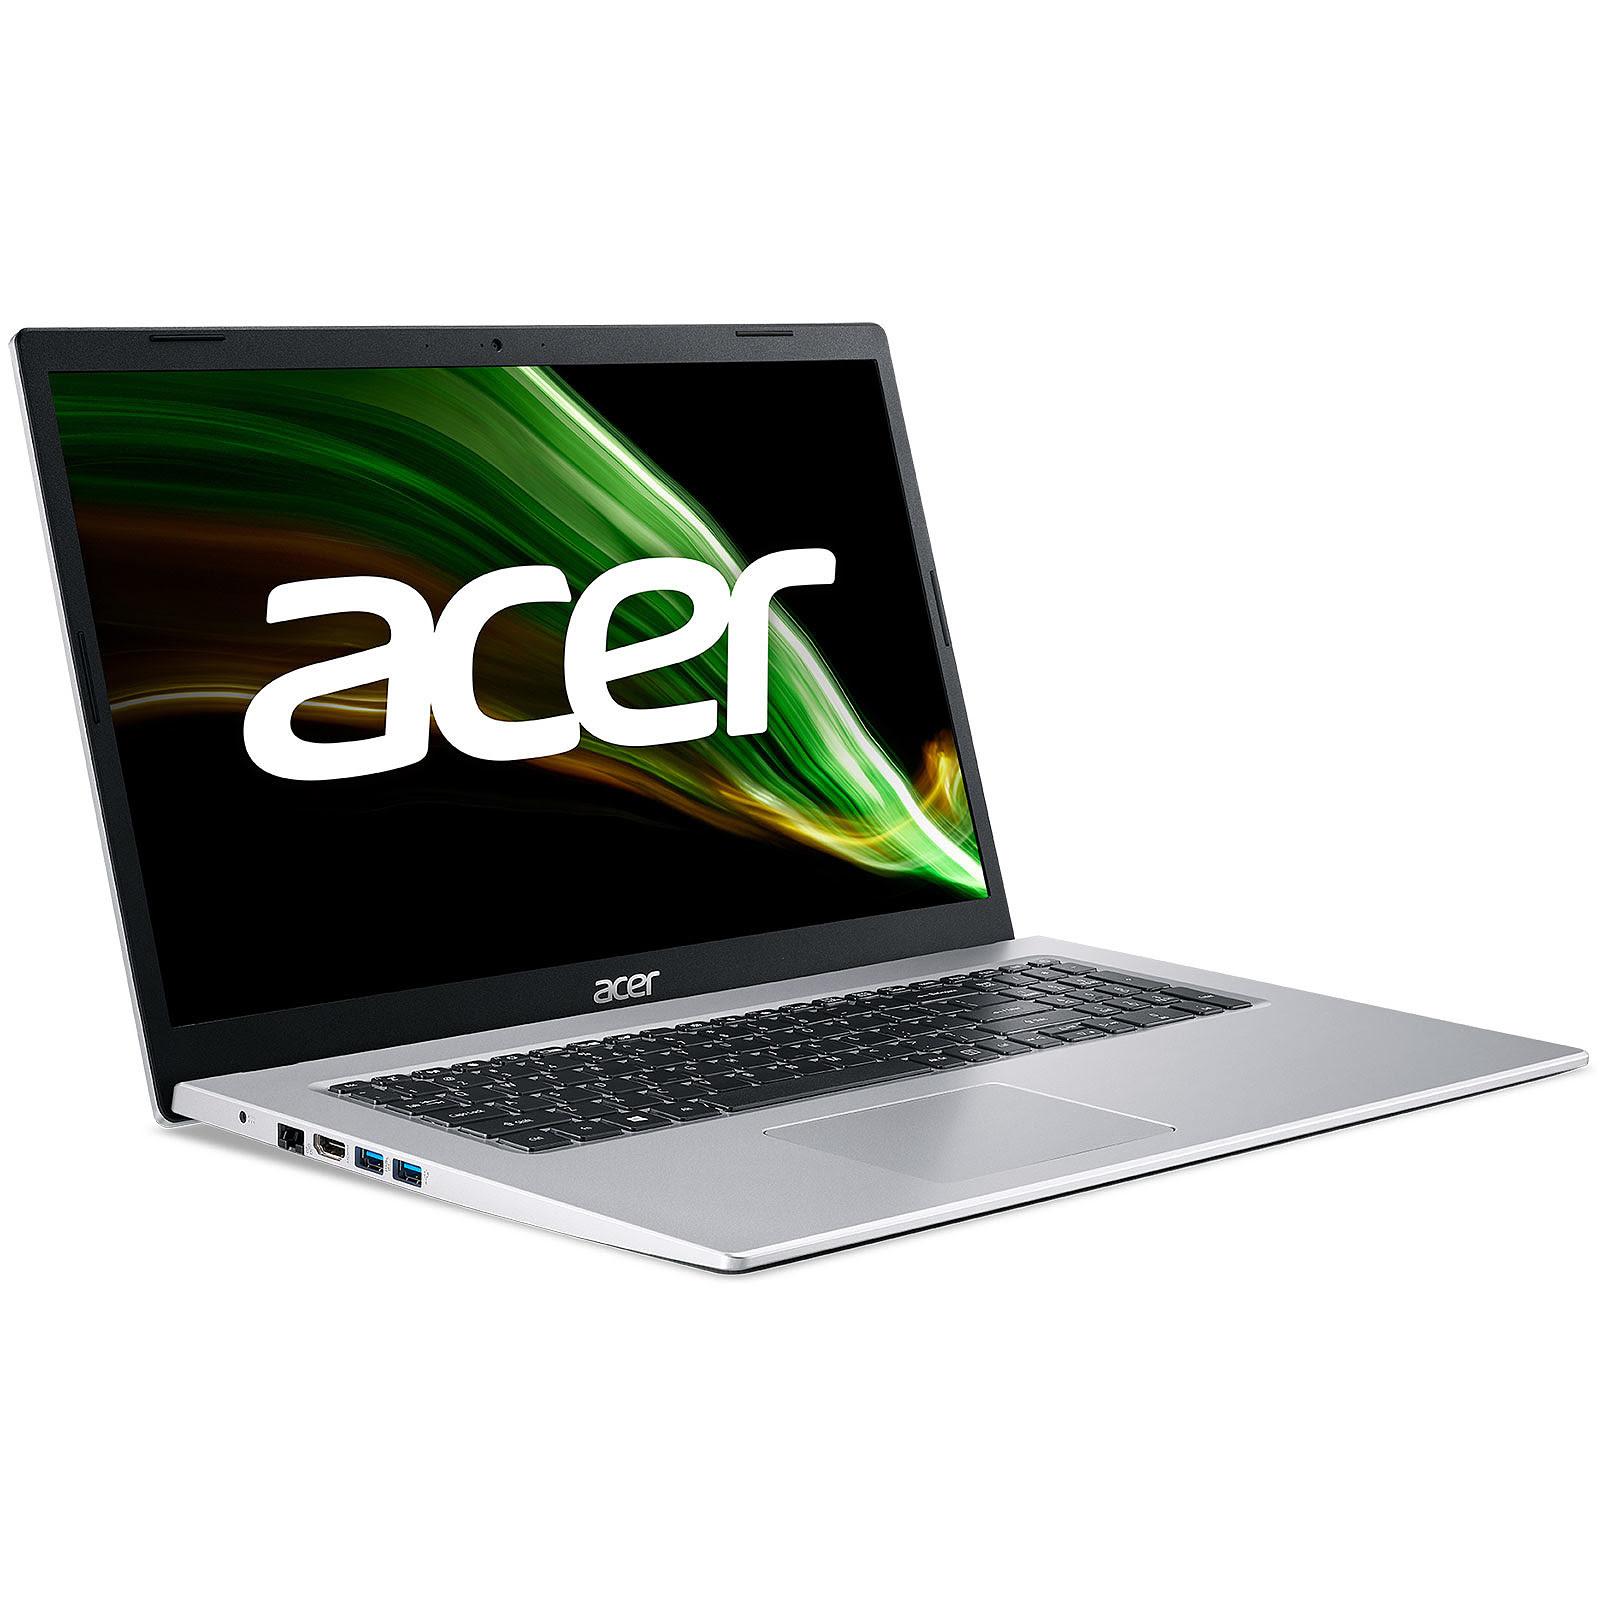 Acer NX.AD0EF.00G - PC portable Acer - Cybertek.fr - 1